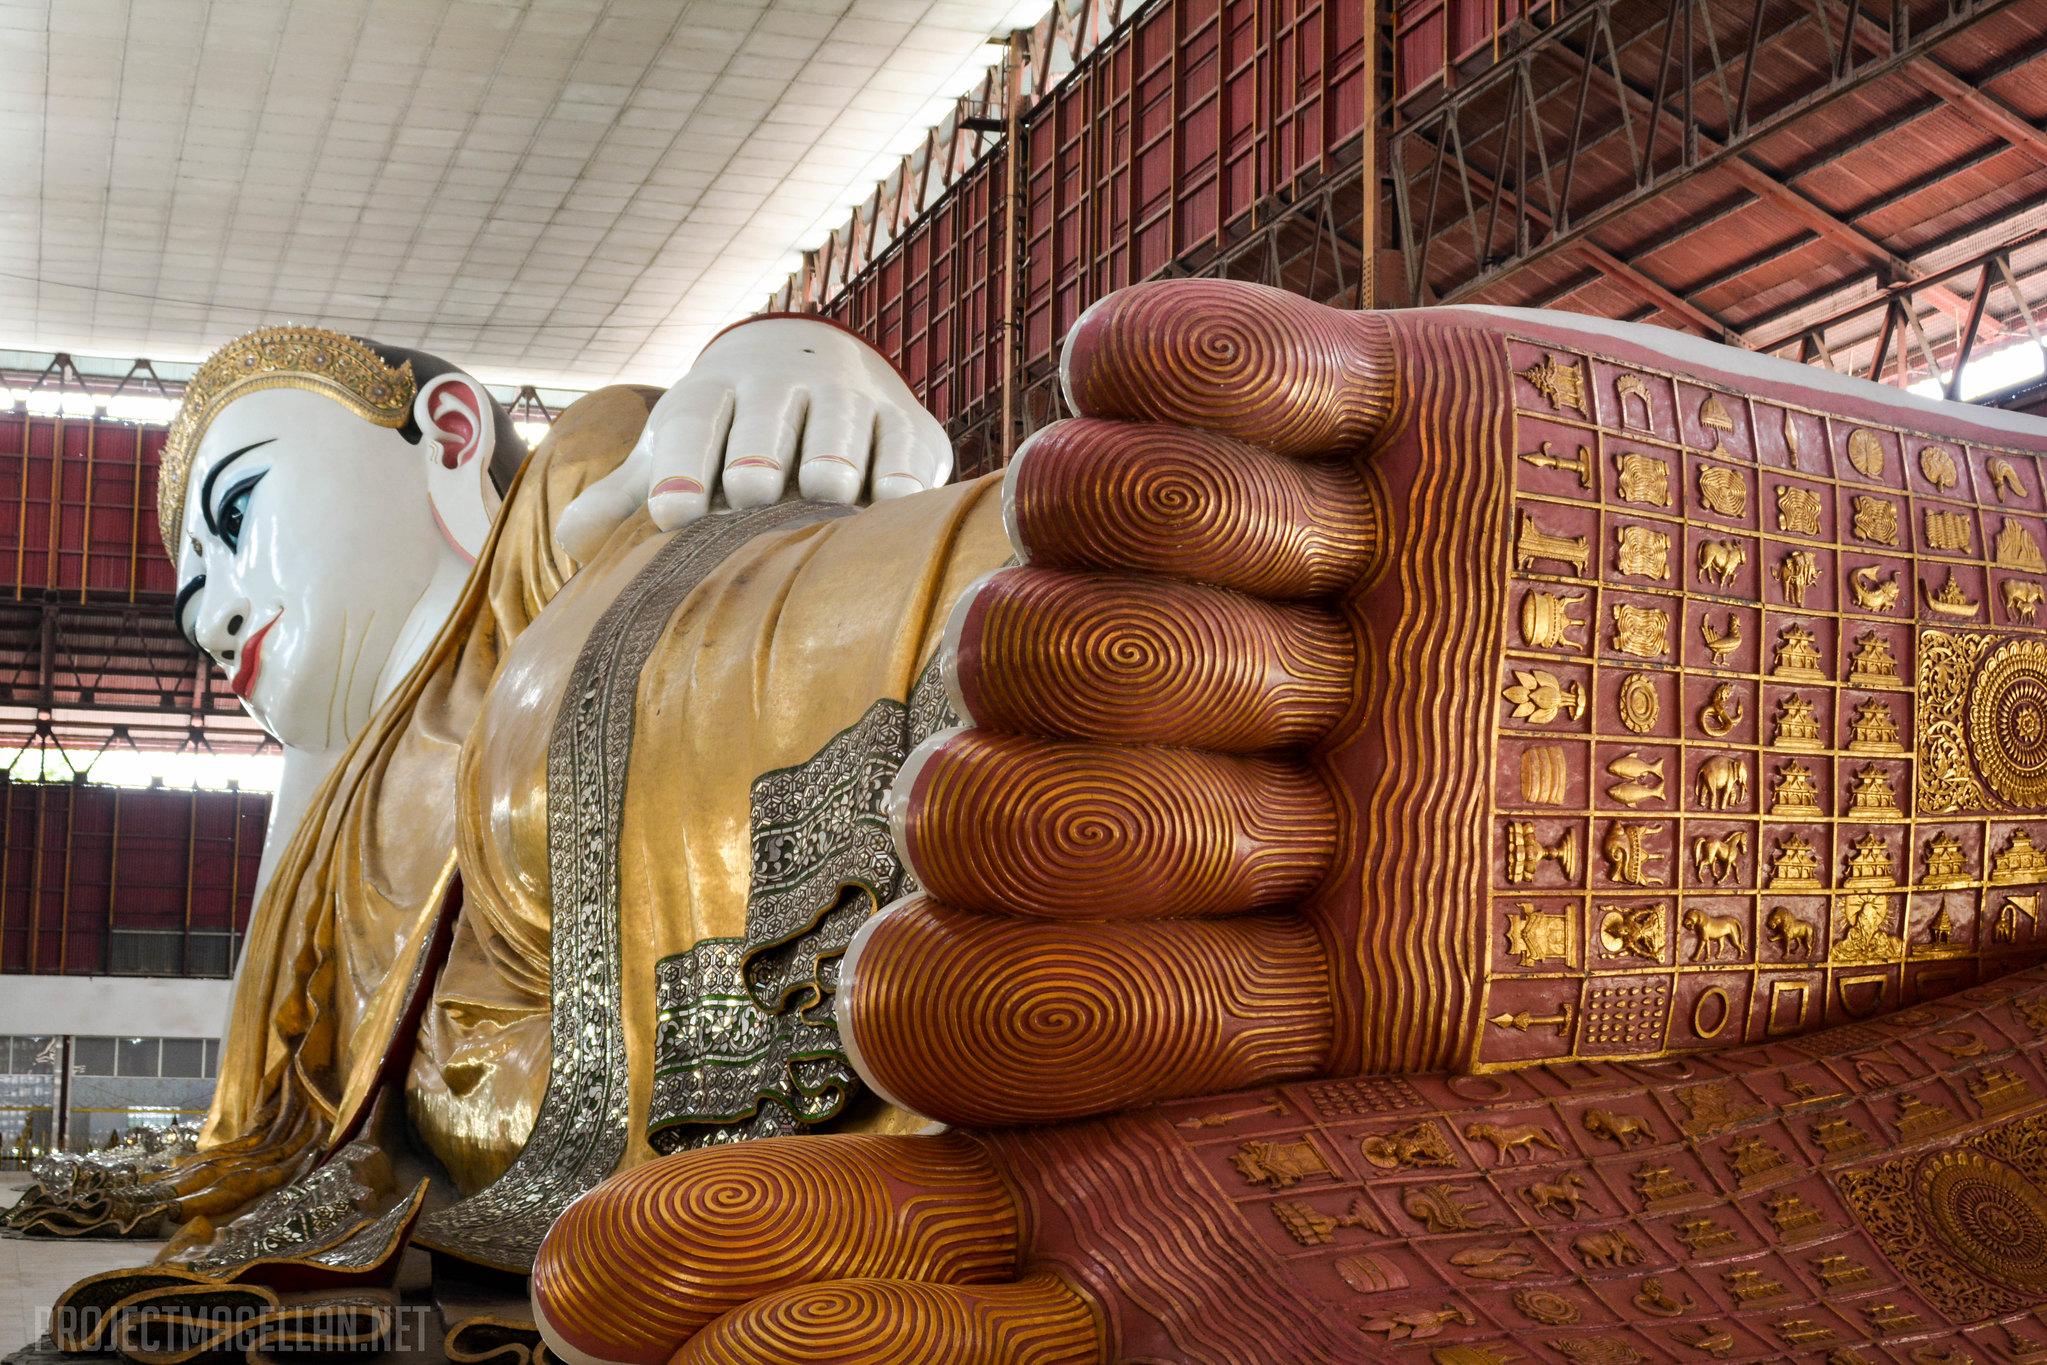 Reclining Buddha, , Yangon, Myanmar, Burma, Rangoon, Chauk Htat Gyi Pagoda